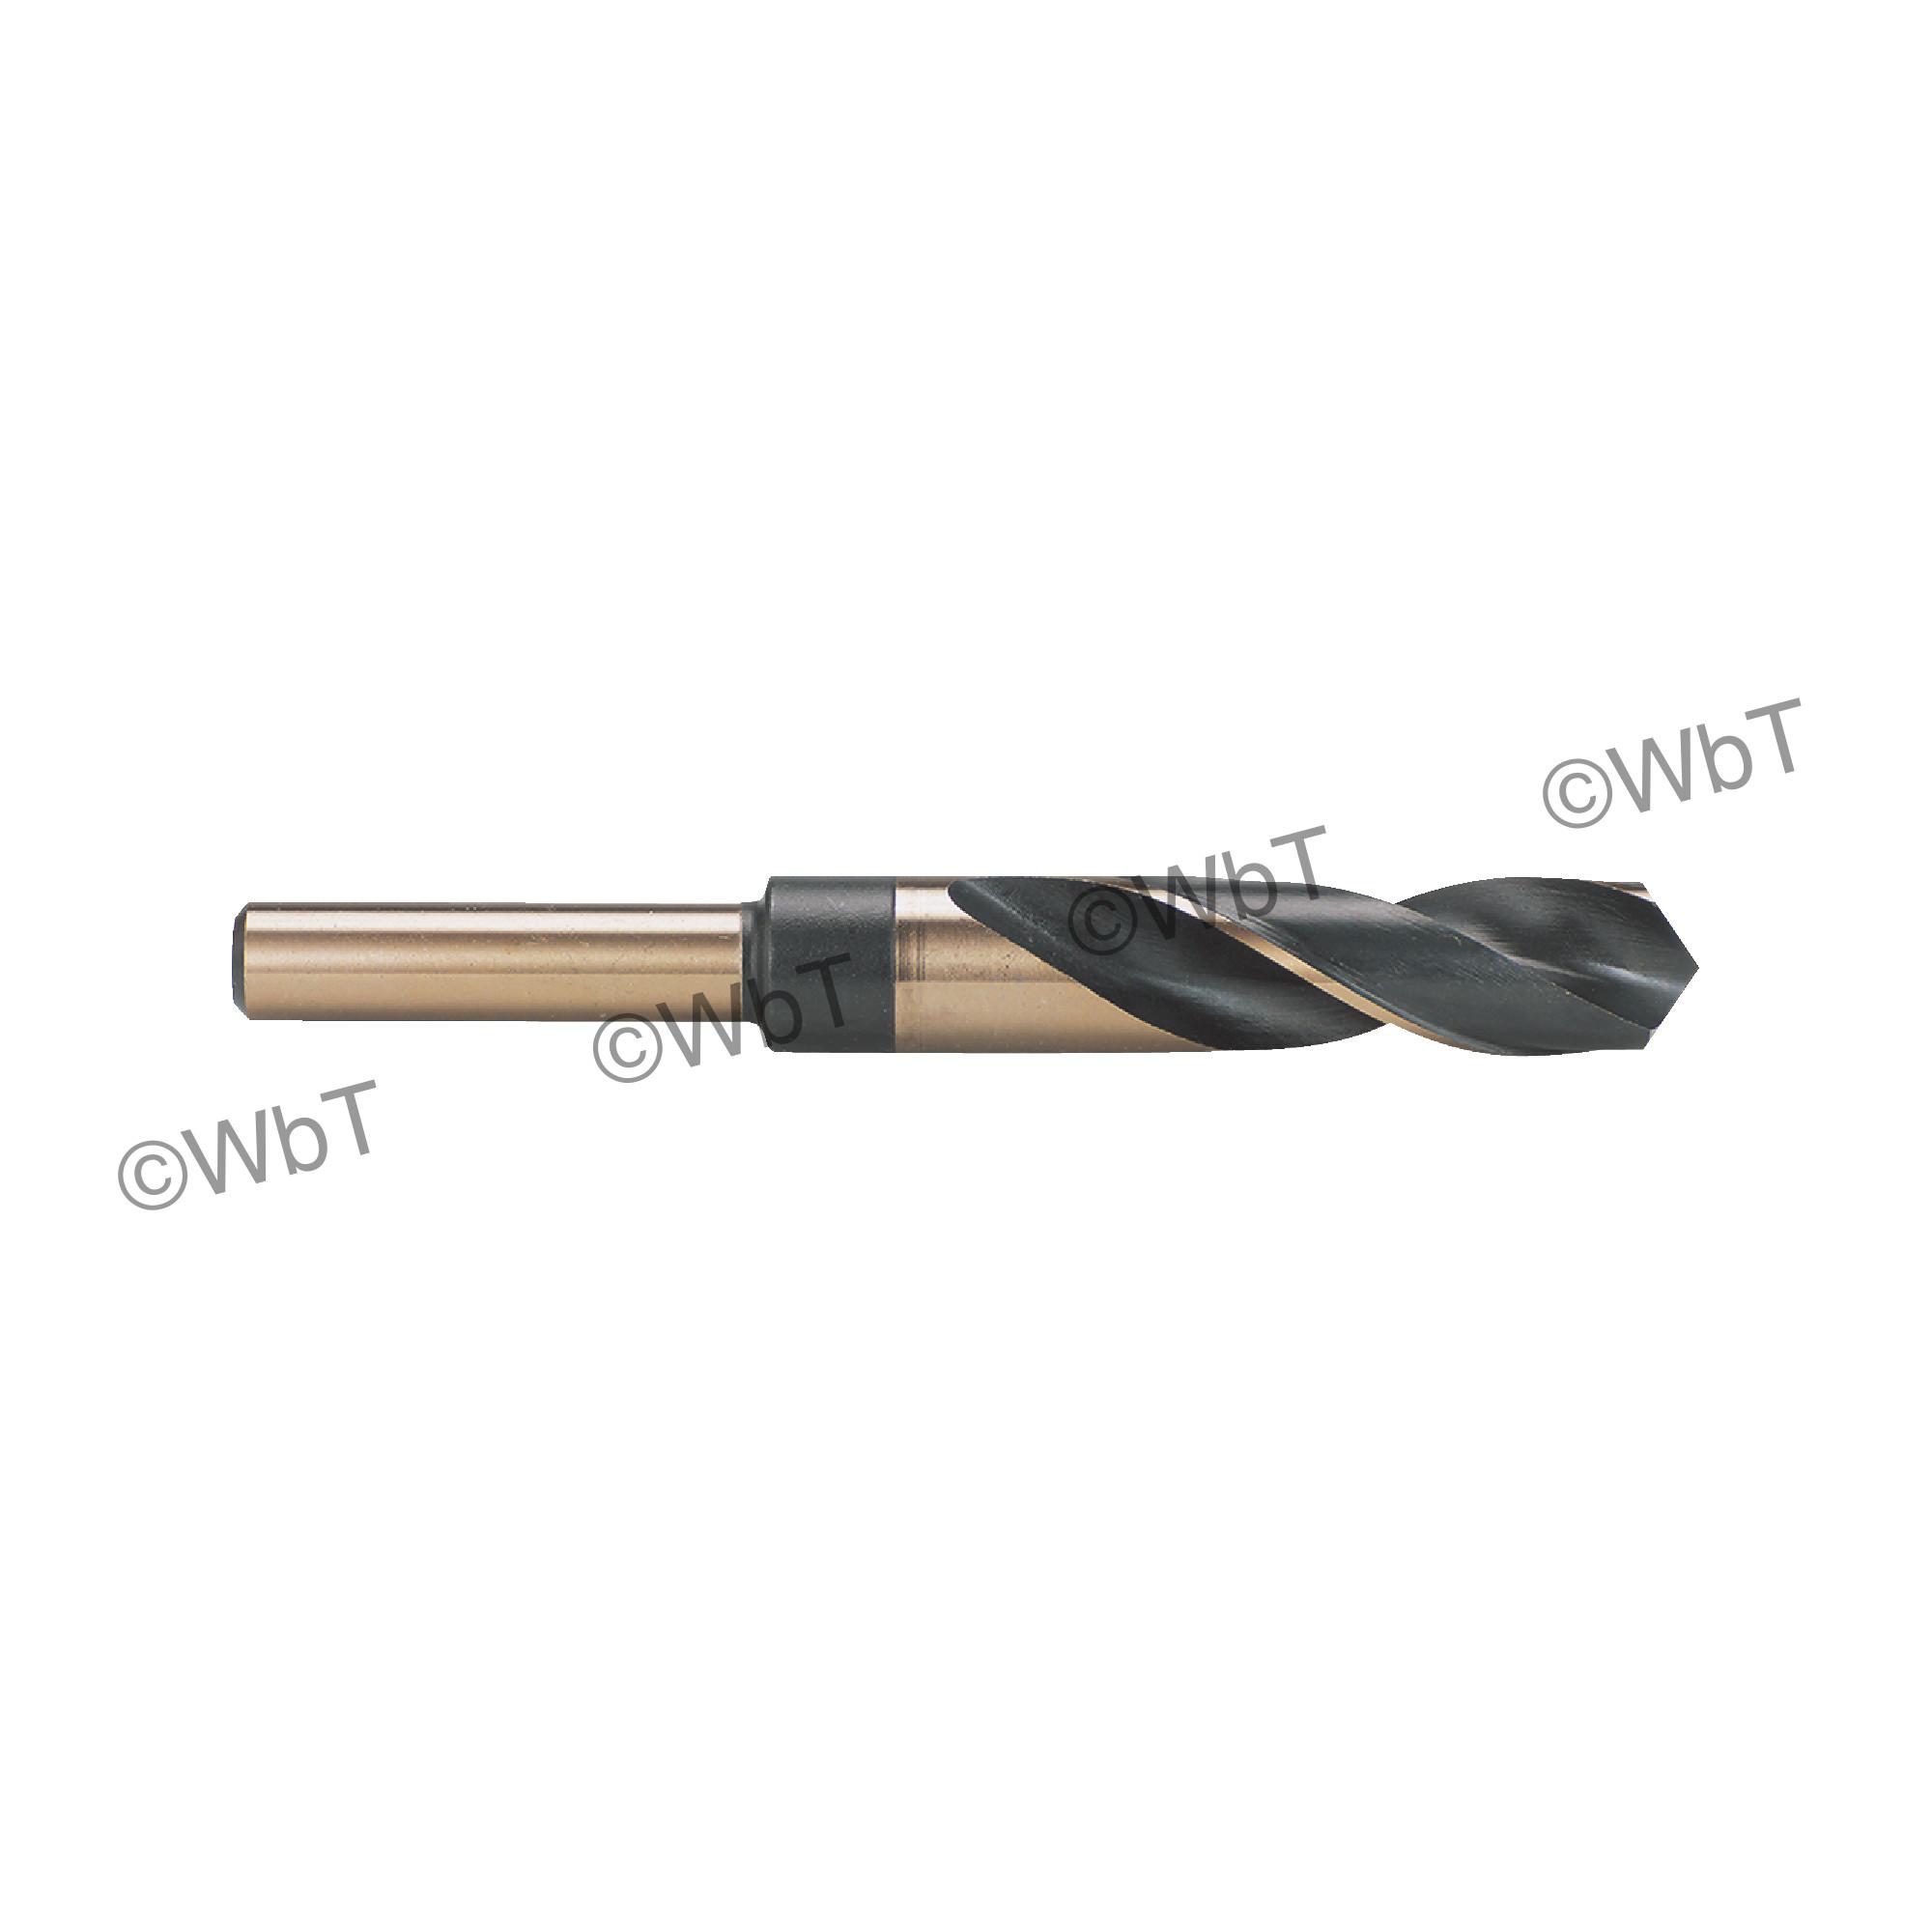 Cobalt Silver & Deming Drills